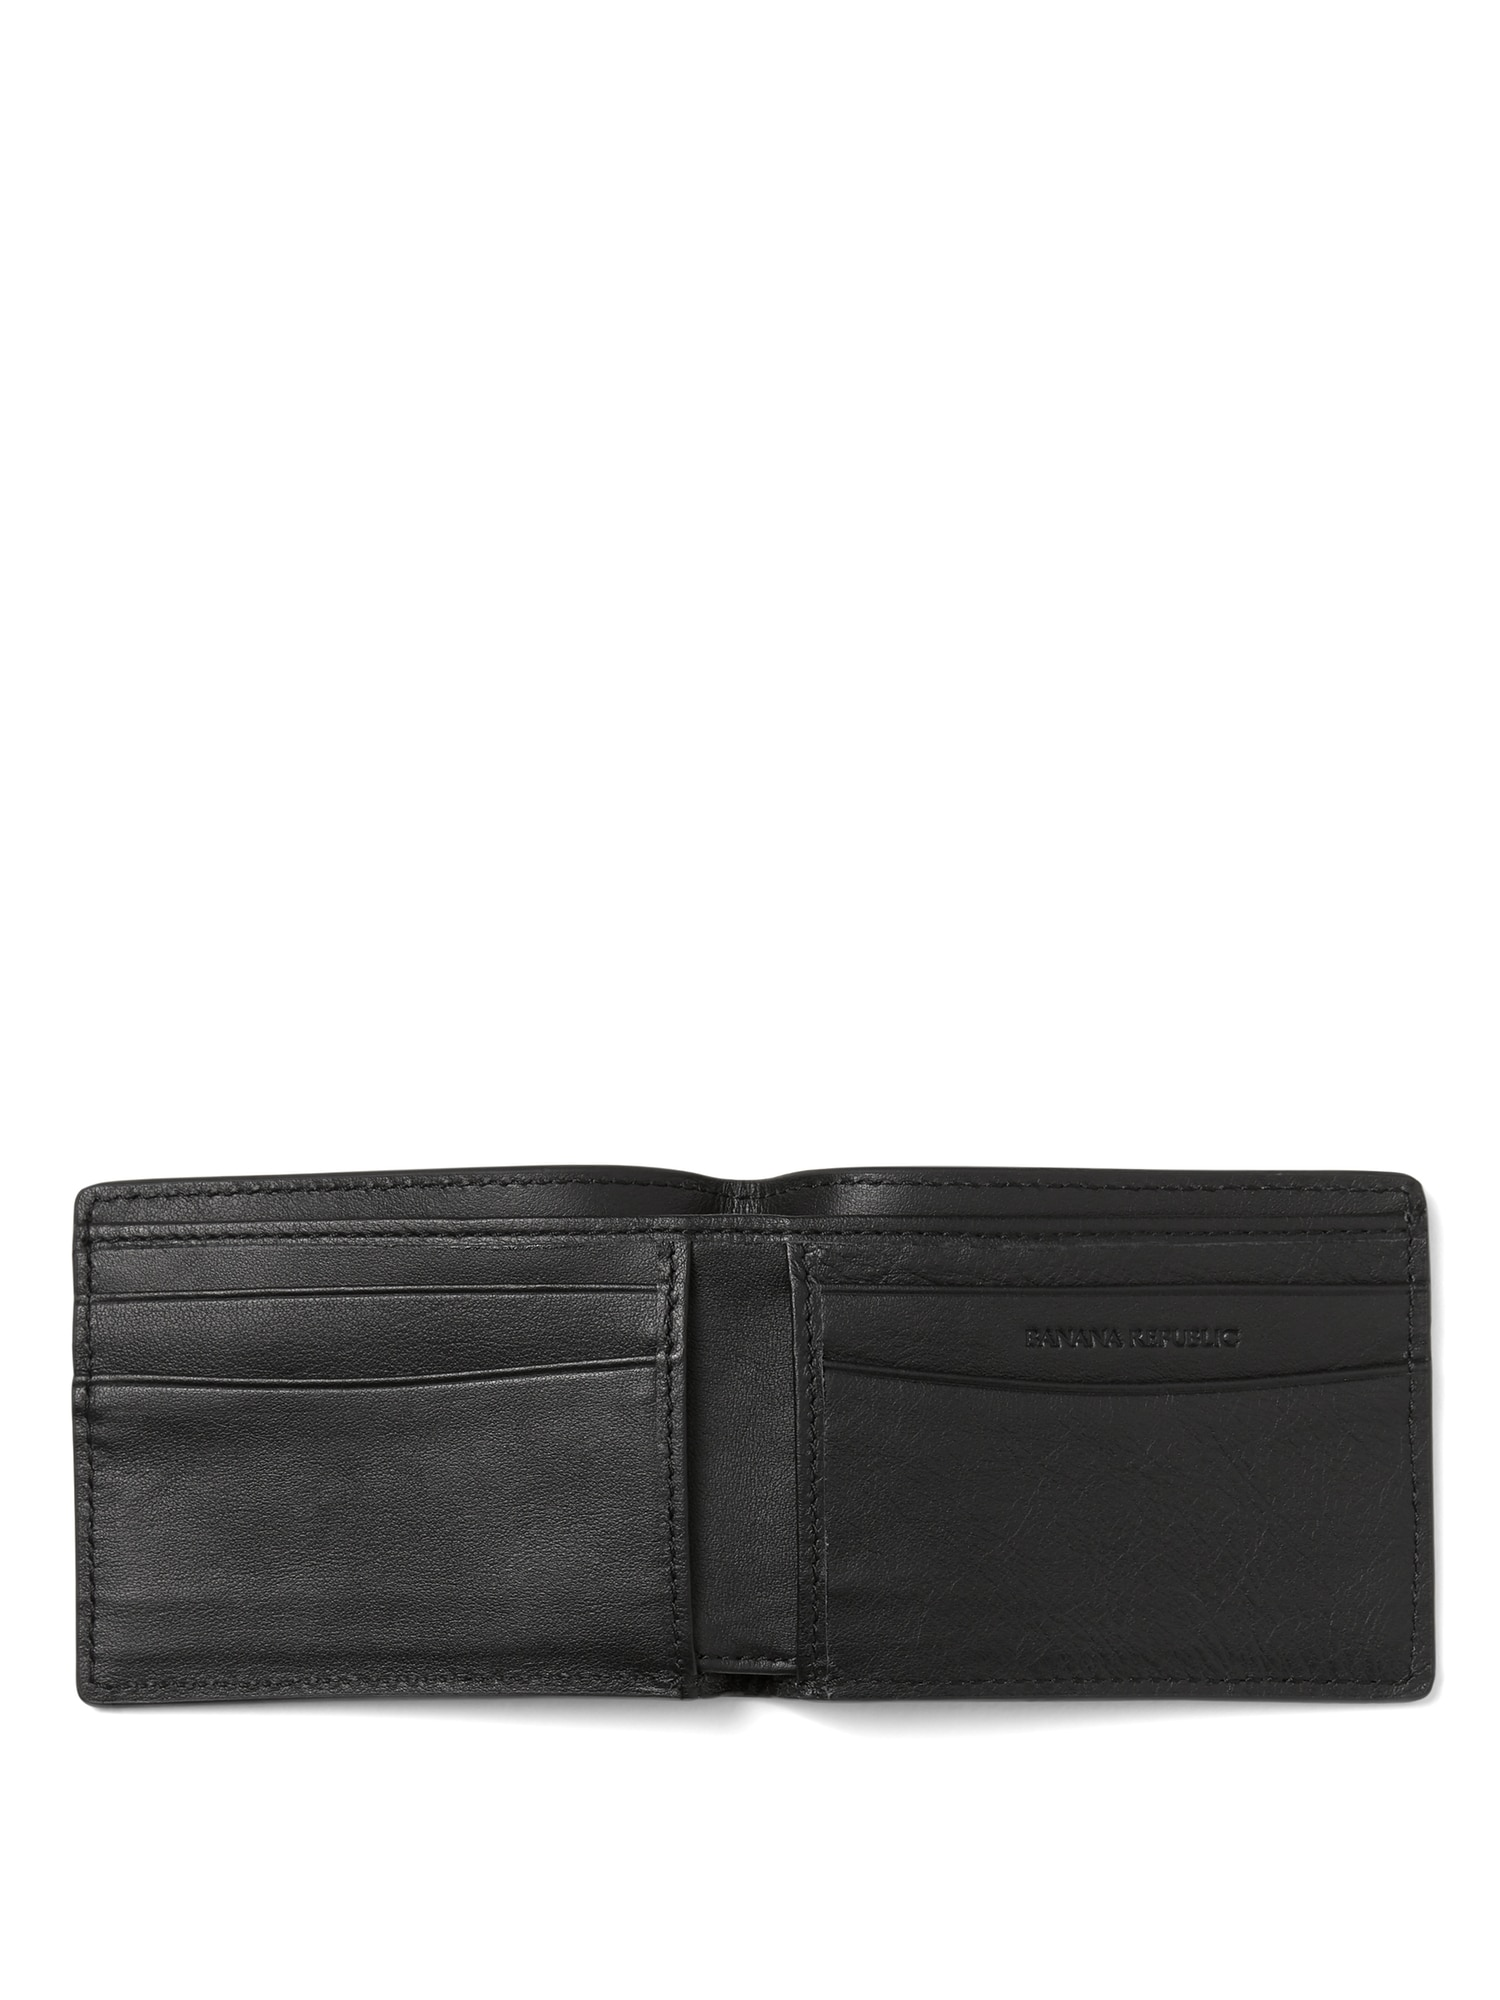 84b3d48d Leather Billfold Wallet | Banana Republic